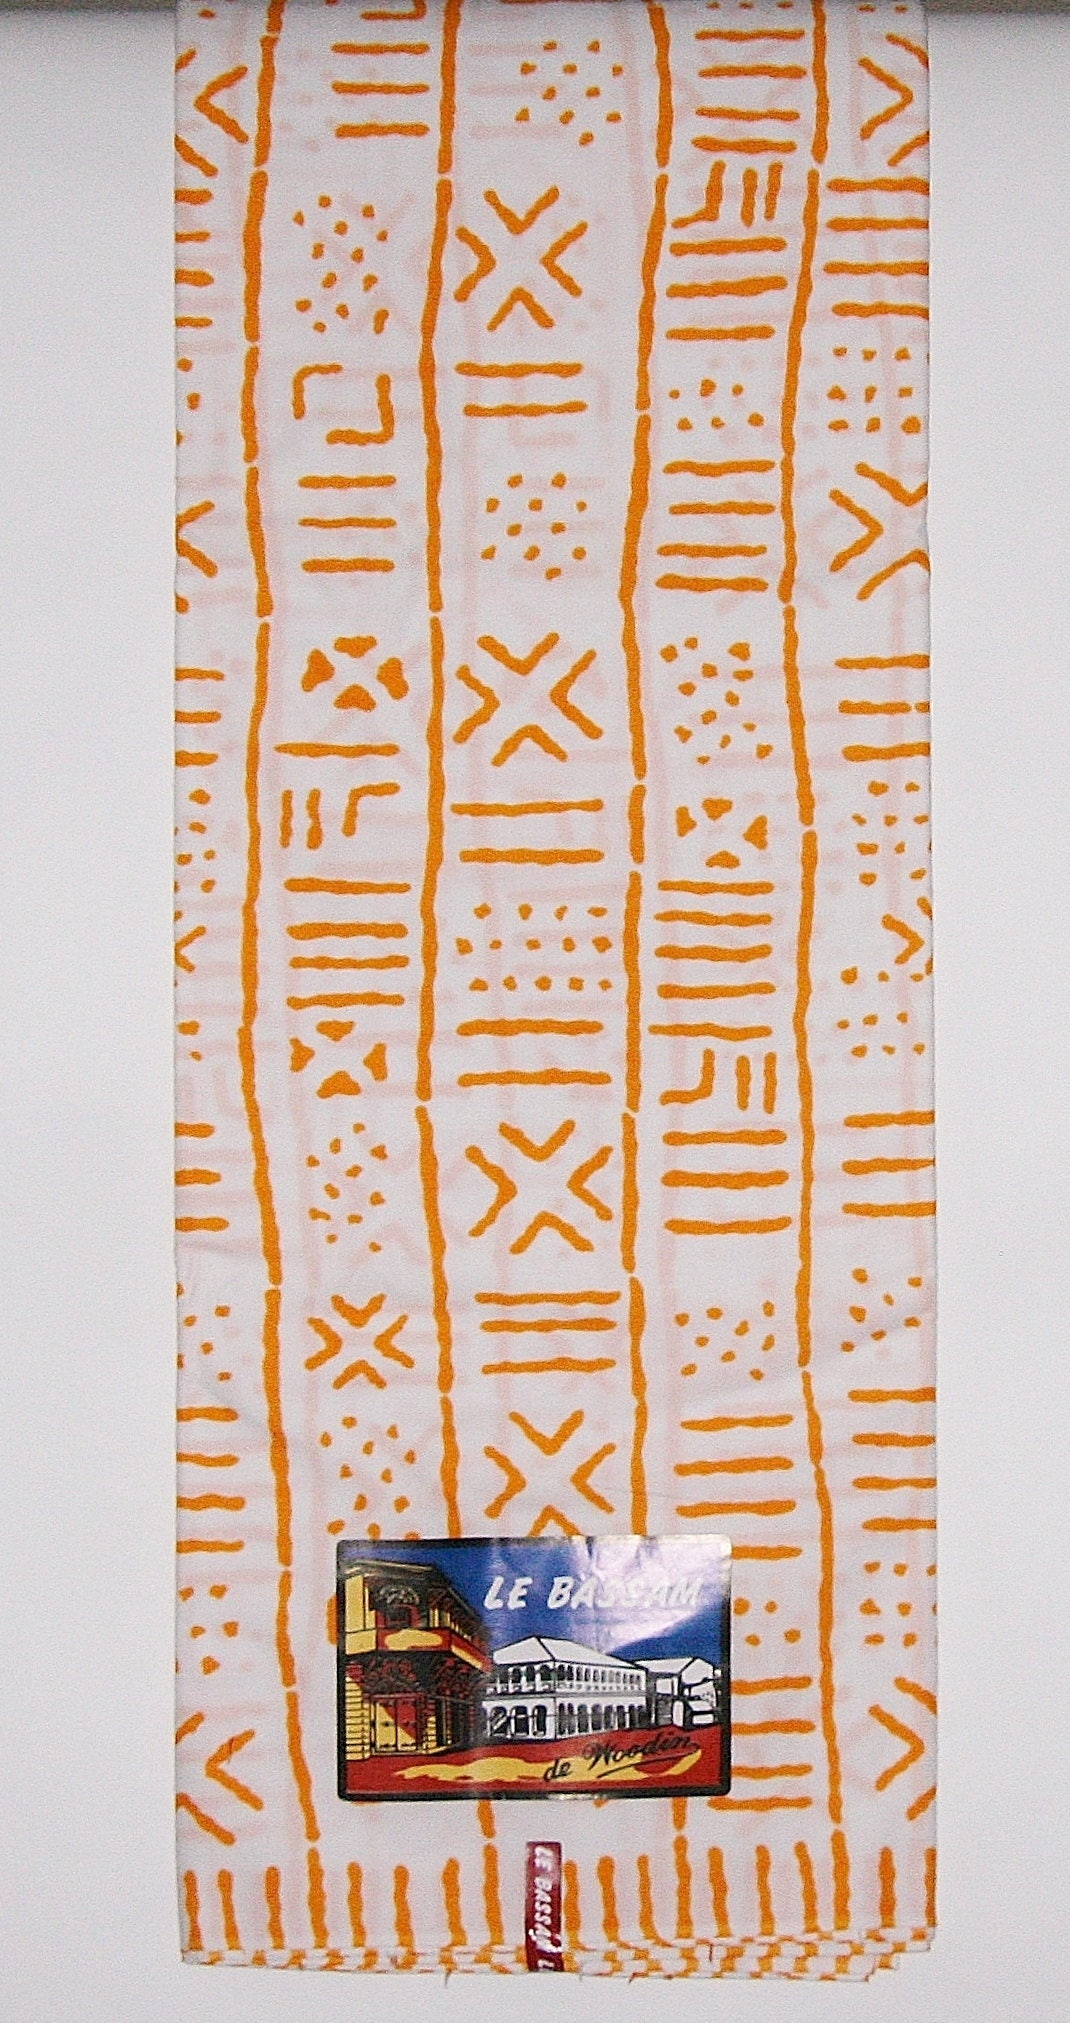 Africain Africain Africain tissu 6 Yards Blanc Orange Le Bassam de Woodin classique Vlisco classique africain Ankara Côte d'Ivoire fc4fce